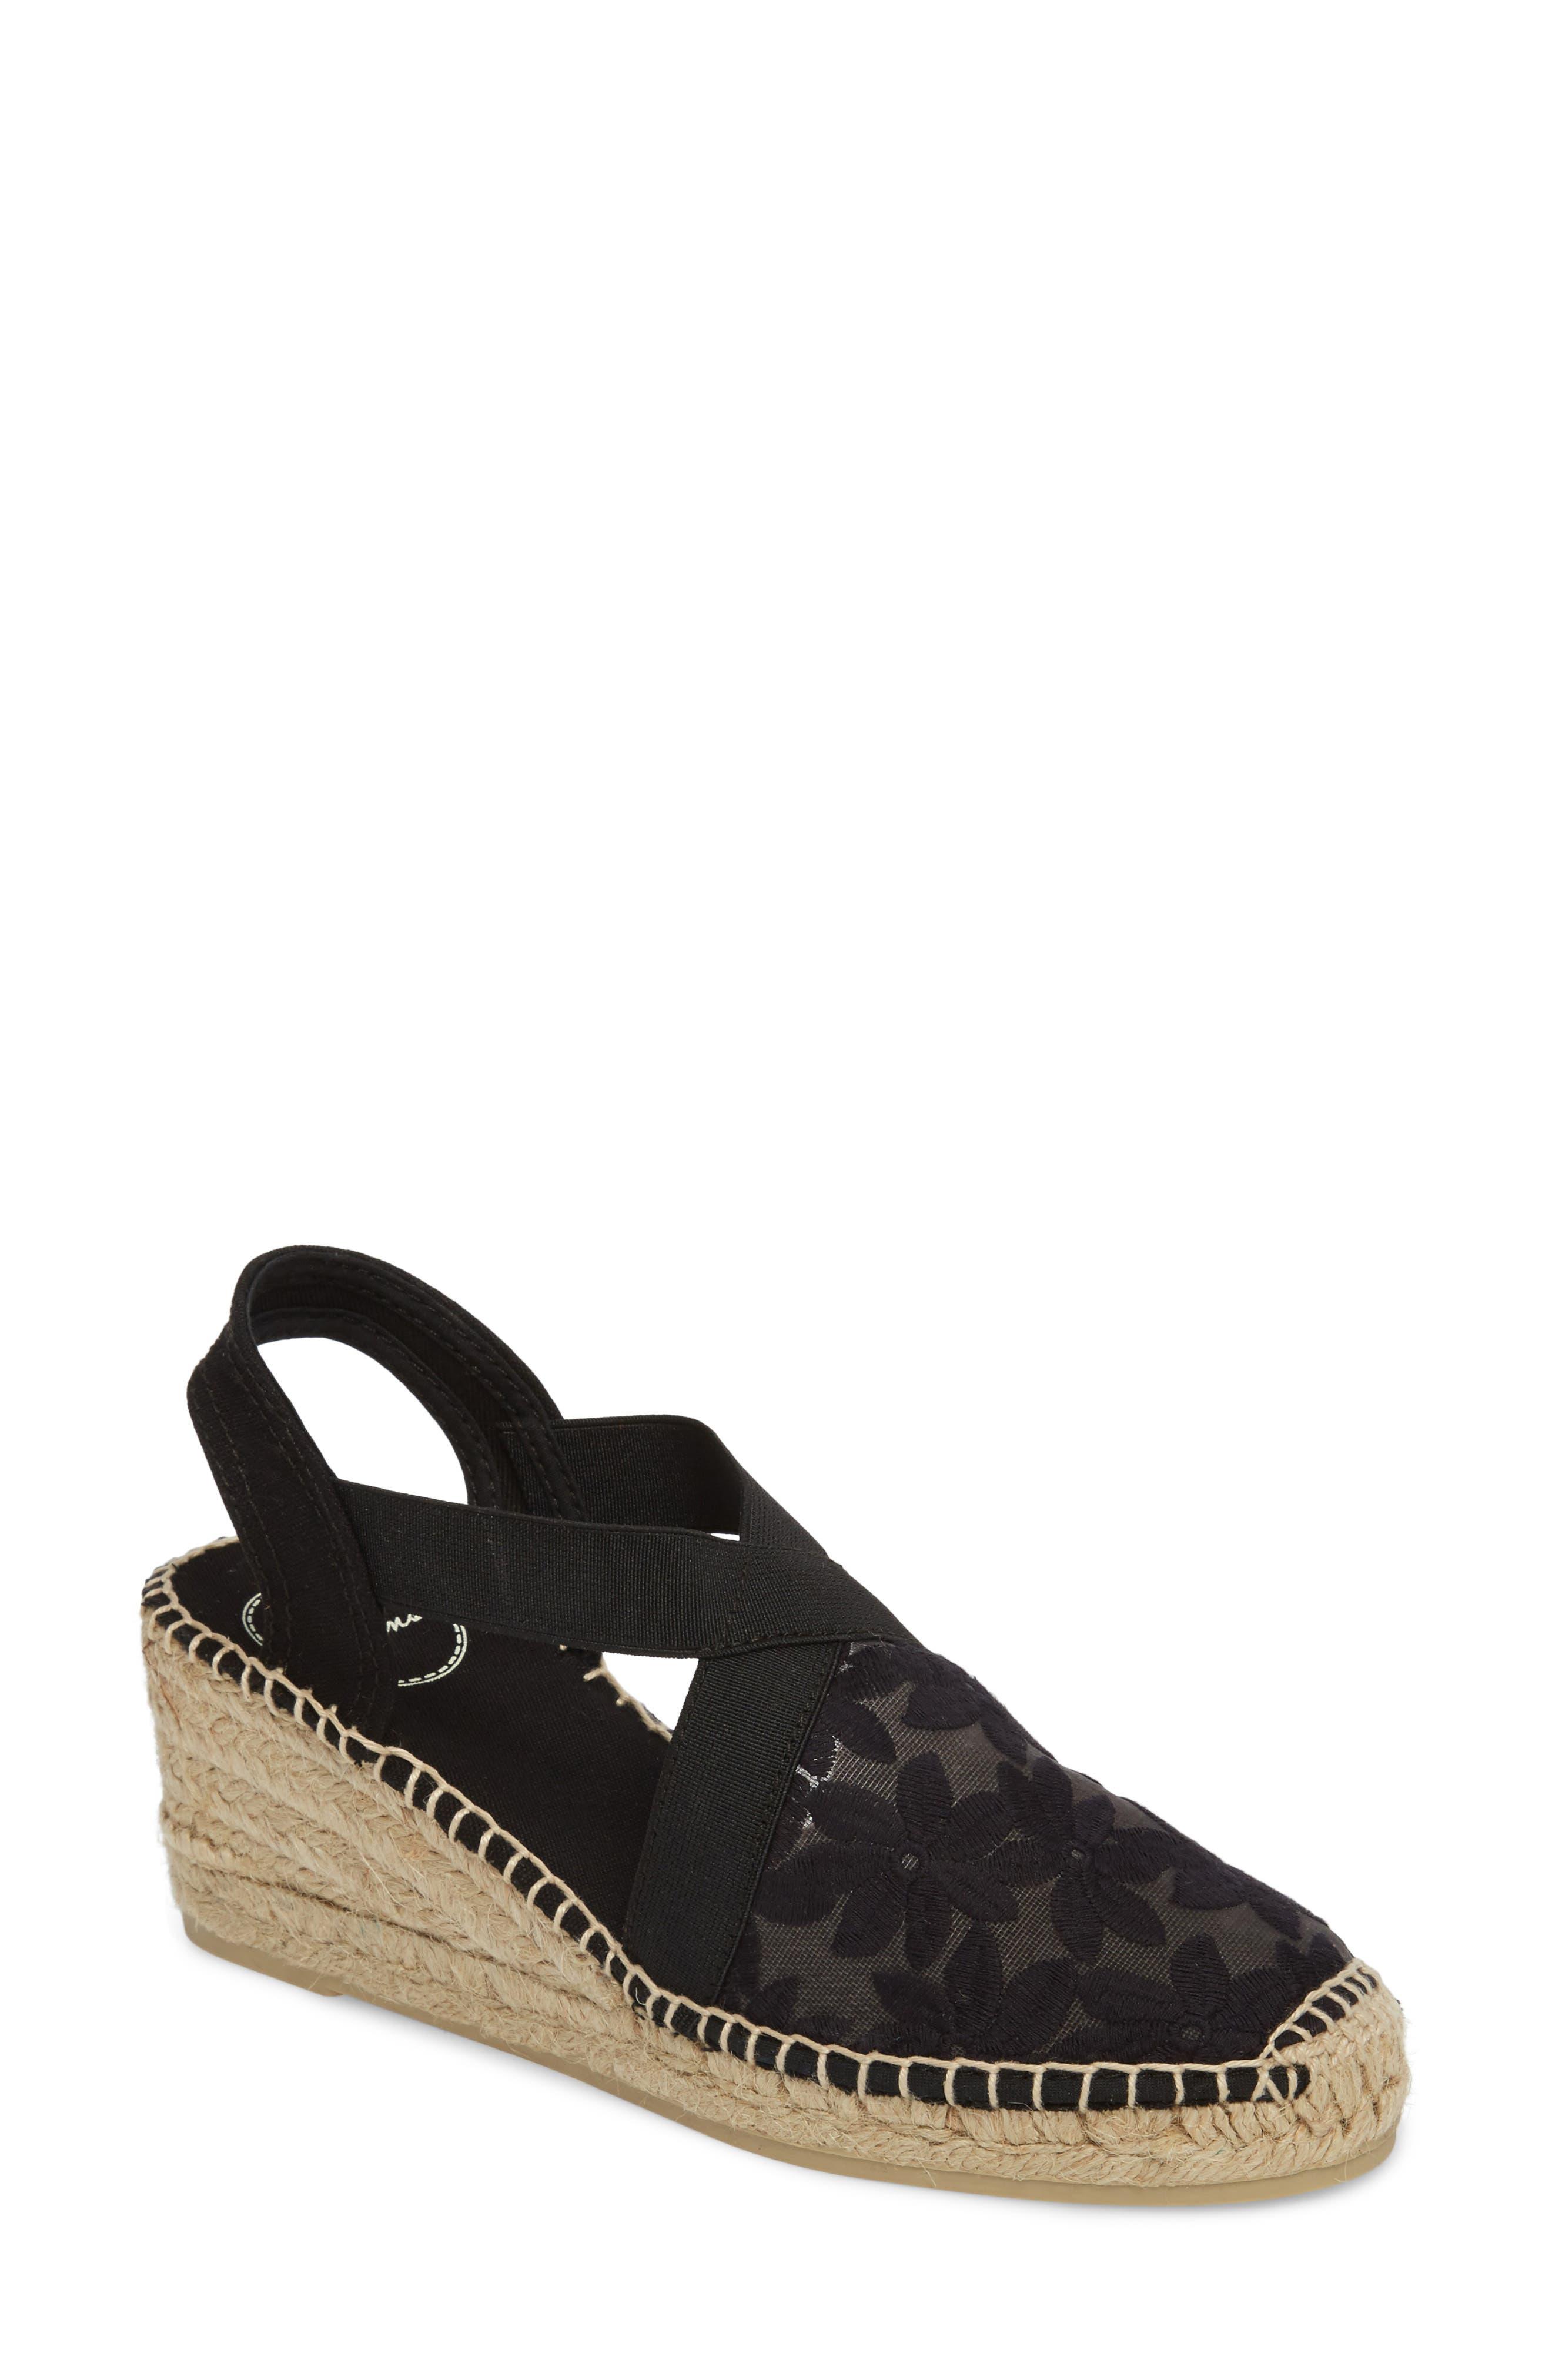 Terra Espadrille Wedge Sandal,                         Main,                         color, Black Fabric